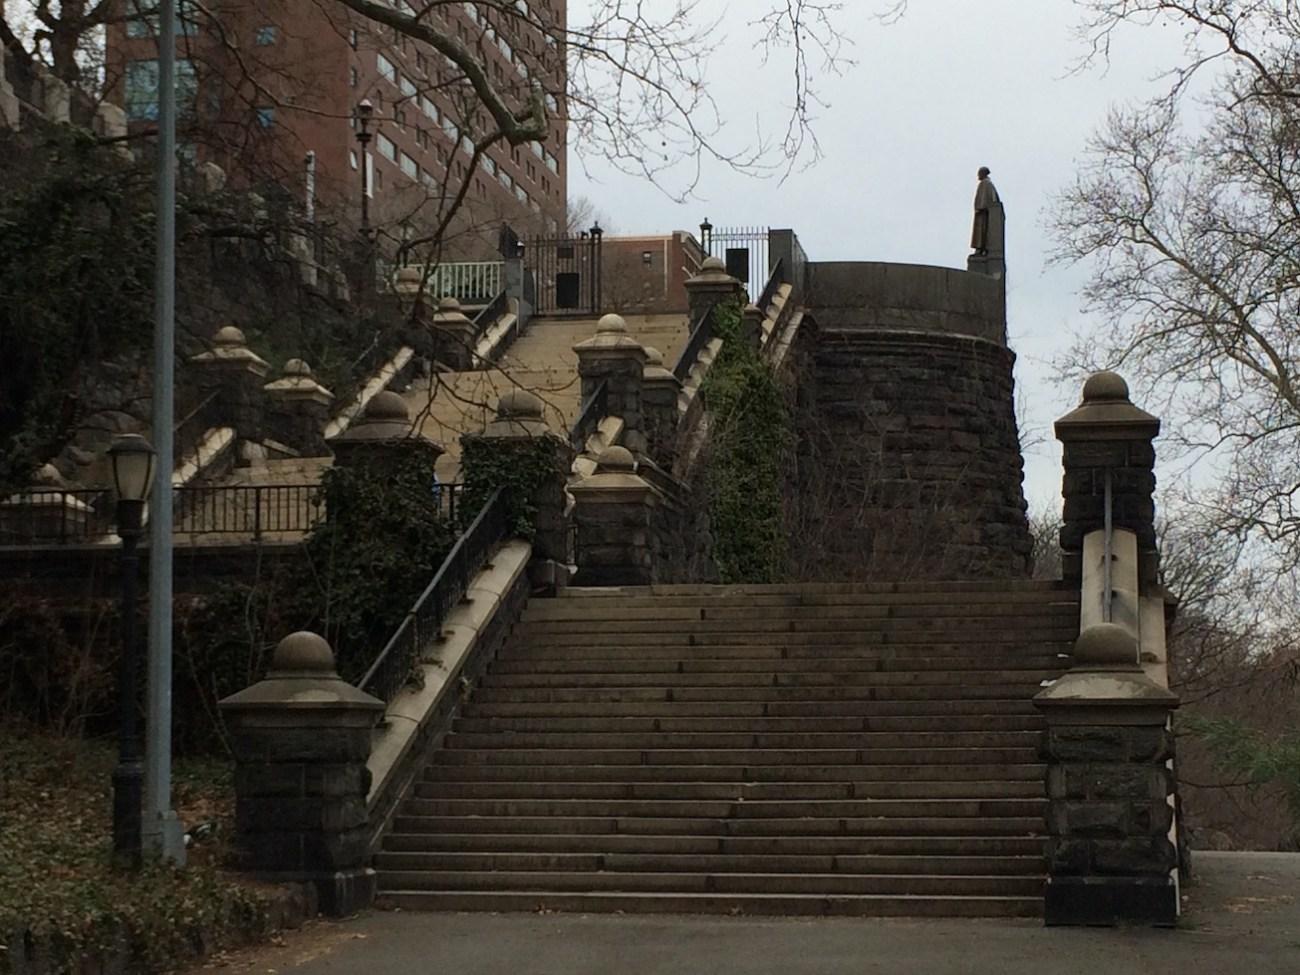 Morningside Park Stair Workout 20